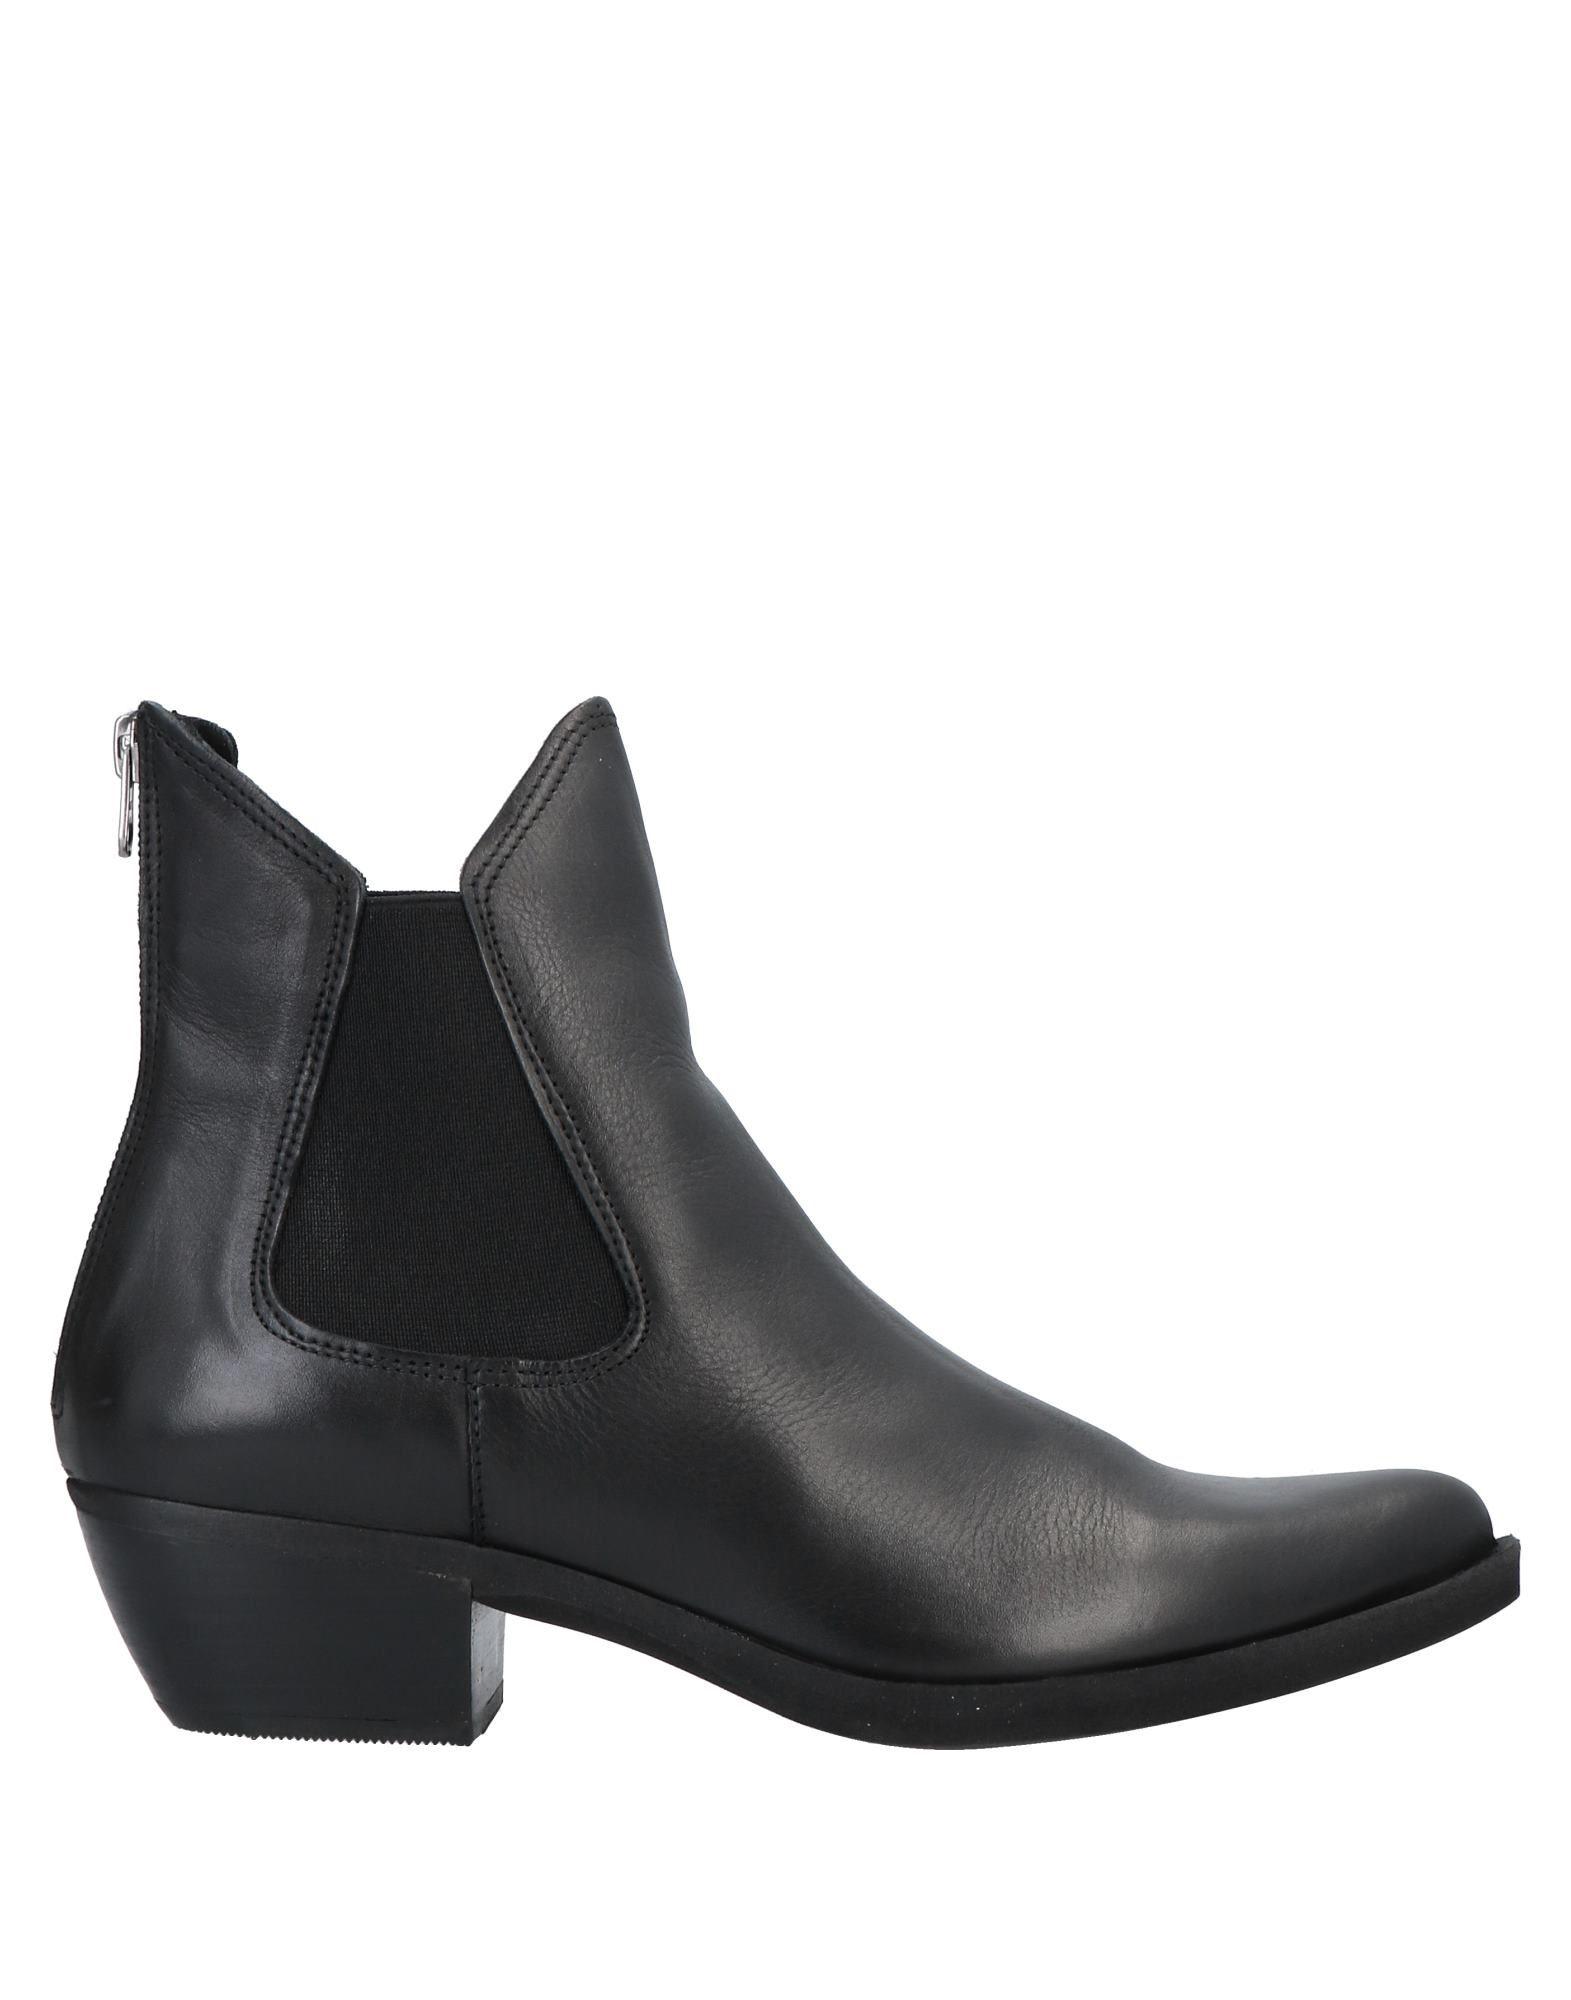 FELMINI Полусапоги и высокие ботинки mazzitti полусапоги и высокие ботинки